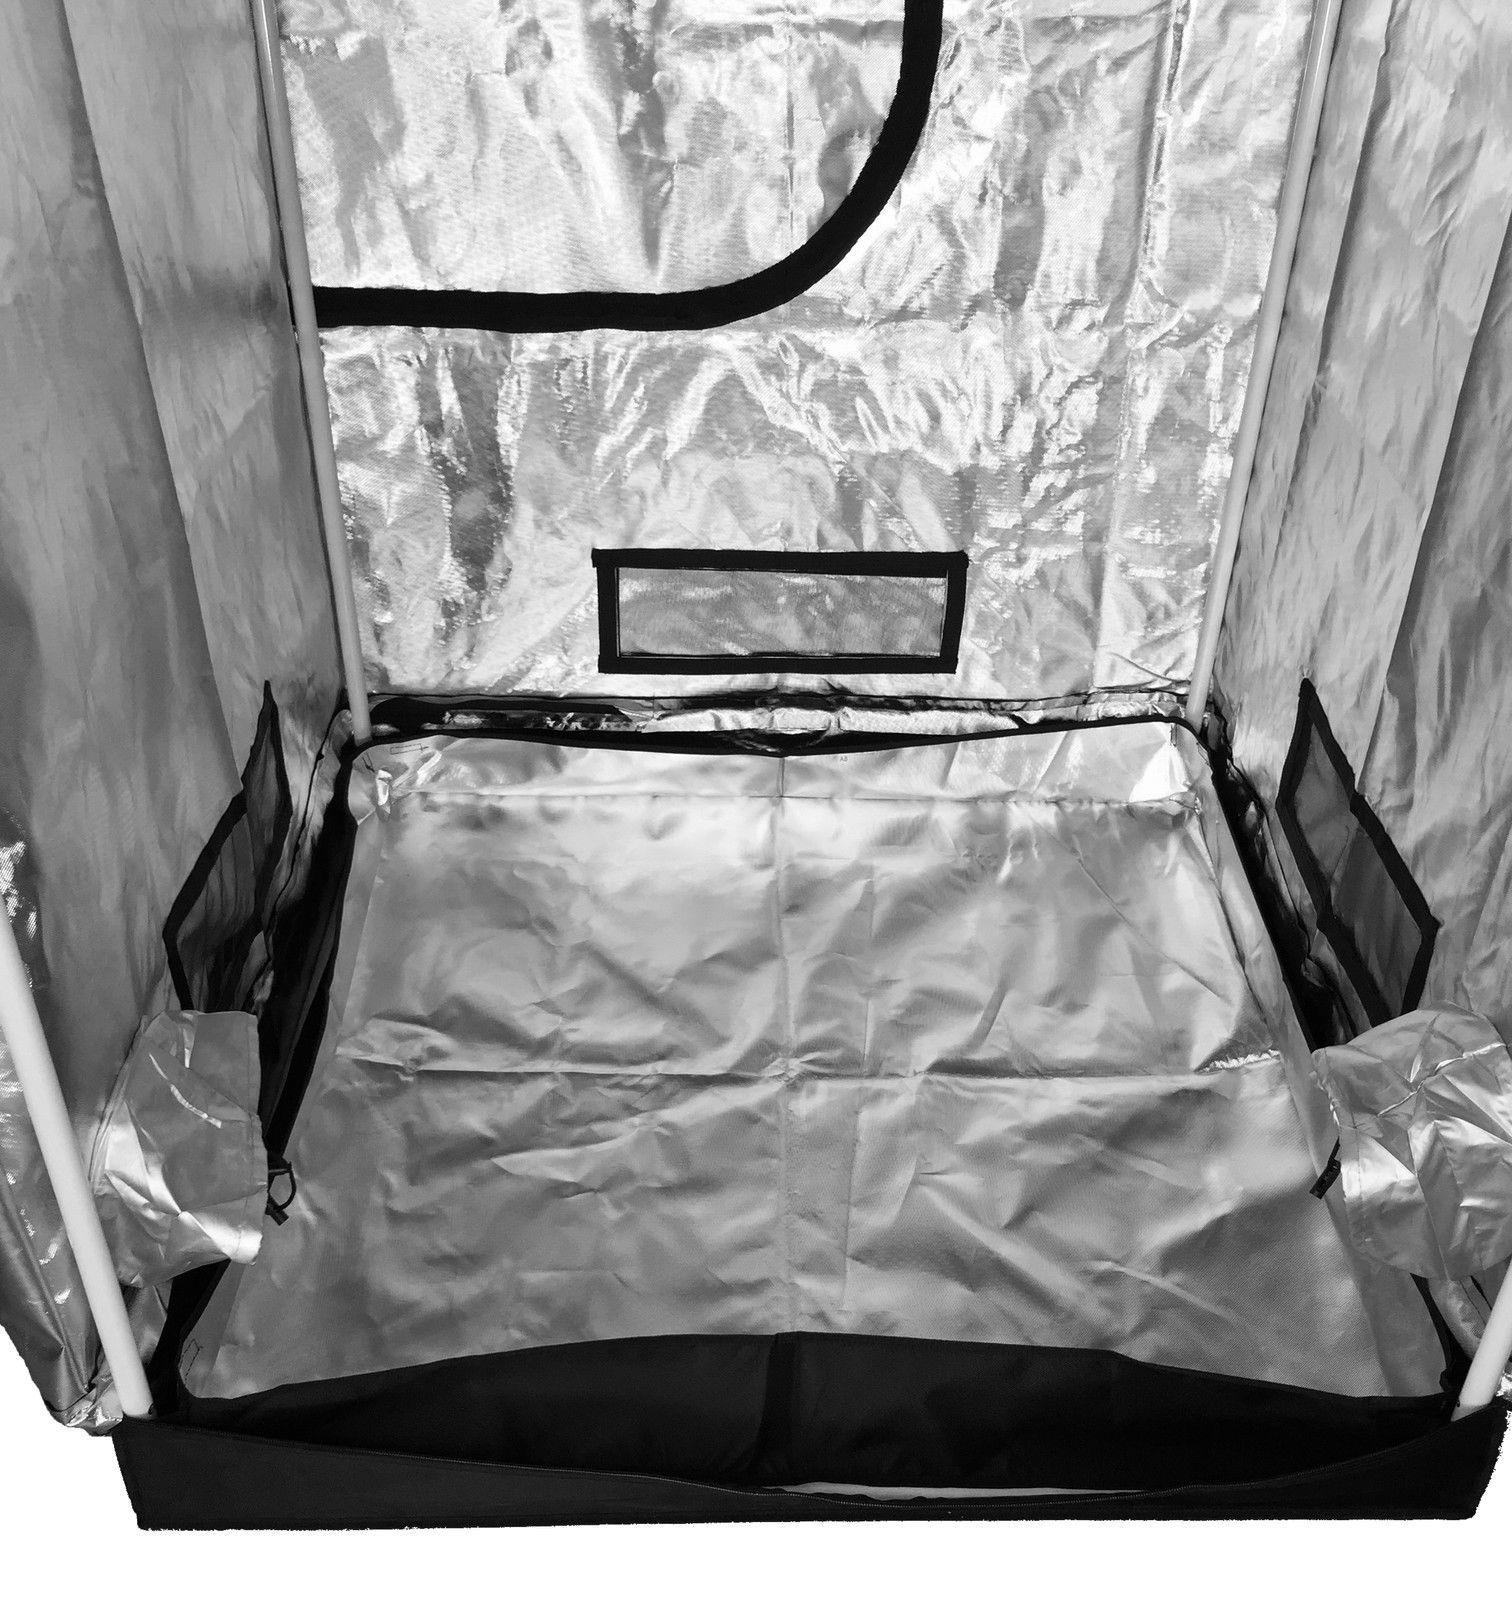 Epic Pro Tall Grow Tent 120 x 120 x 220 cm & Epic Pro Tall Grow Tent 120 x 120 x 220 cm - Green Lamp